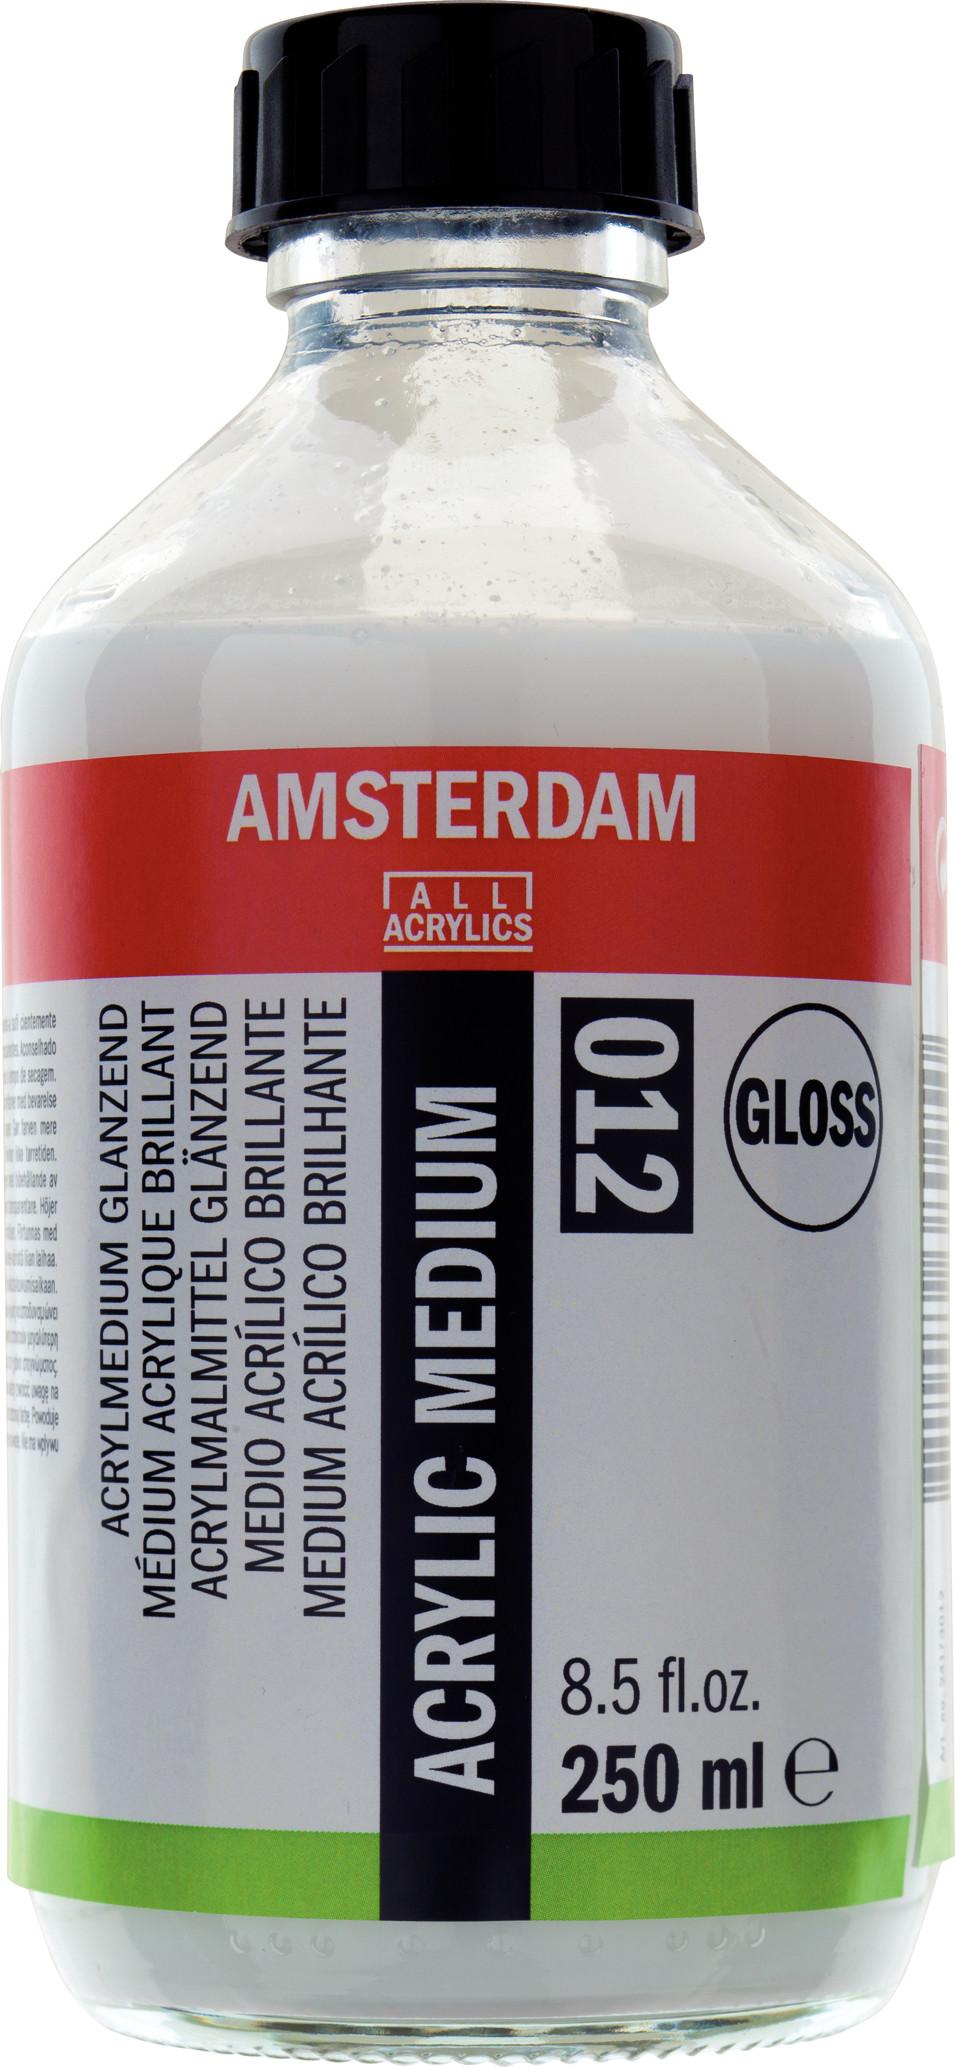 Amsterdam Acrylic Medium Gloss Bottle 250 ml